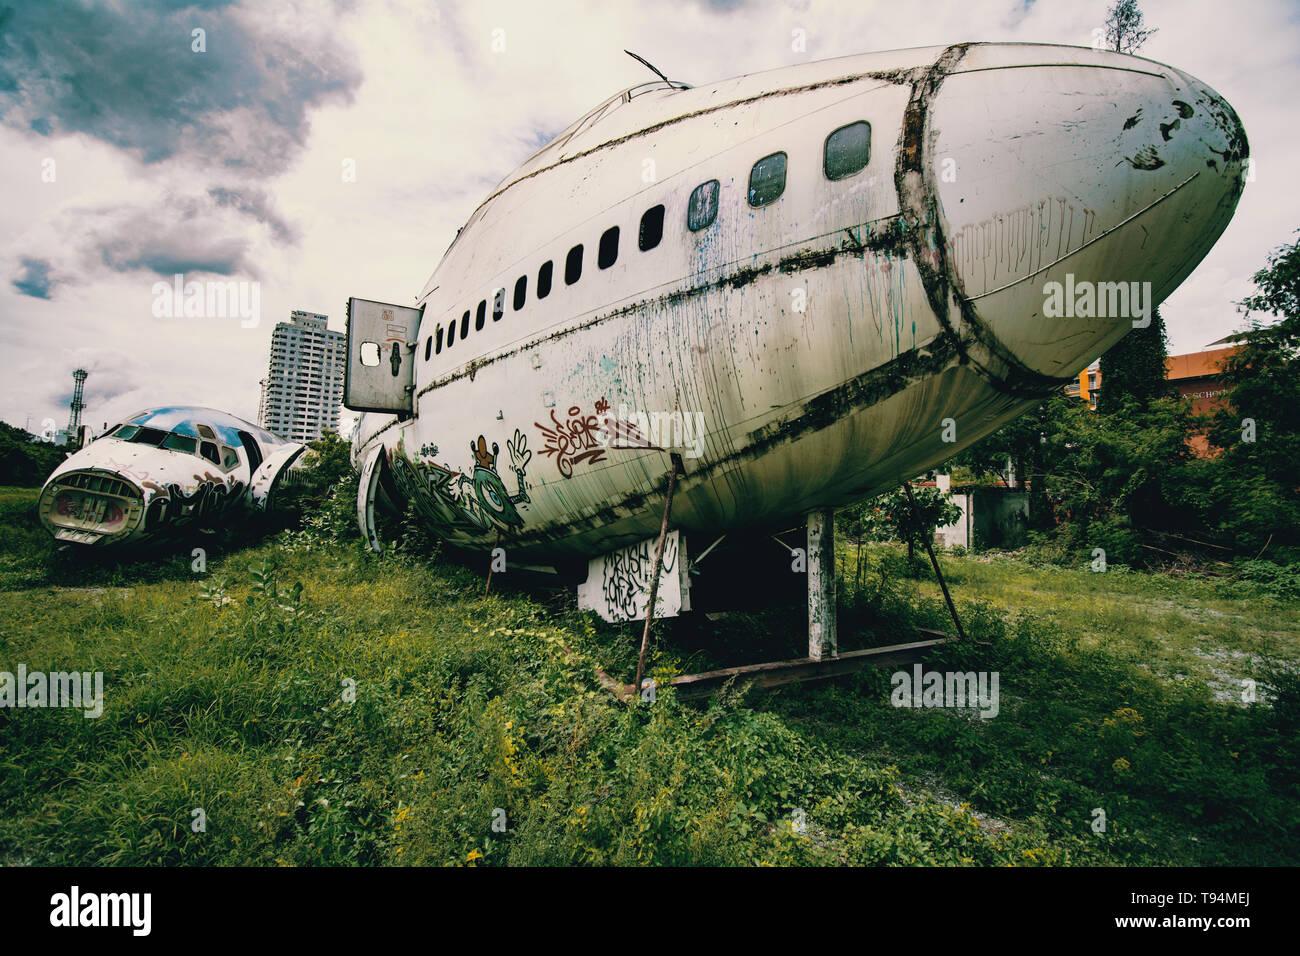 verlassenes Flugzeug in Bangkok das abgestürzt ist - Stock Image